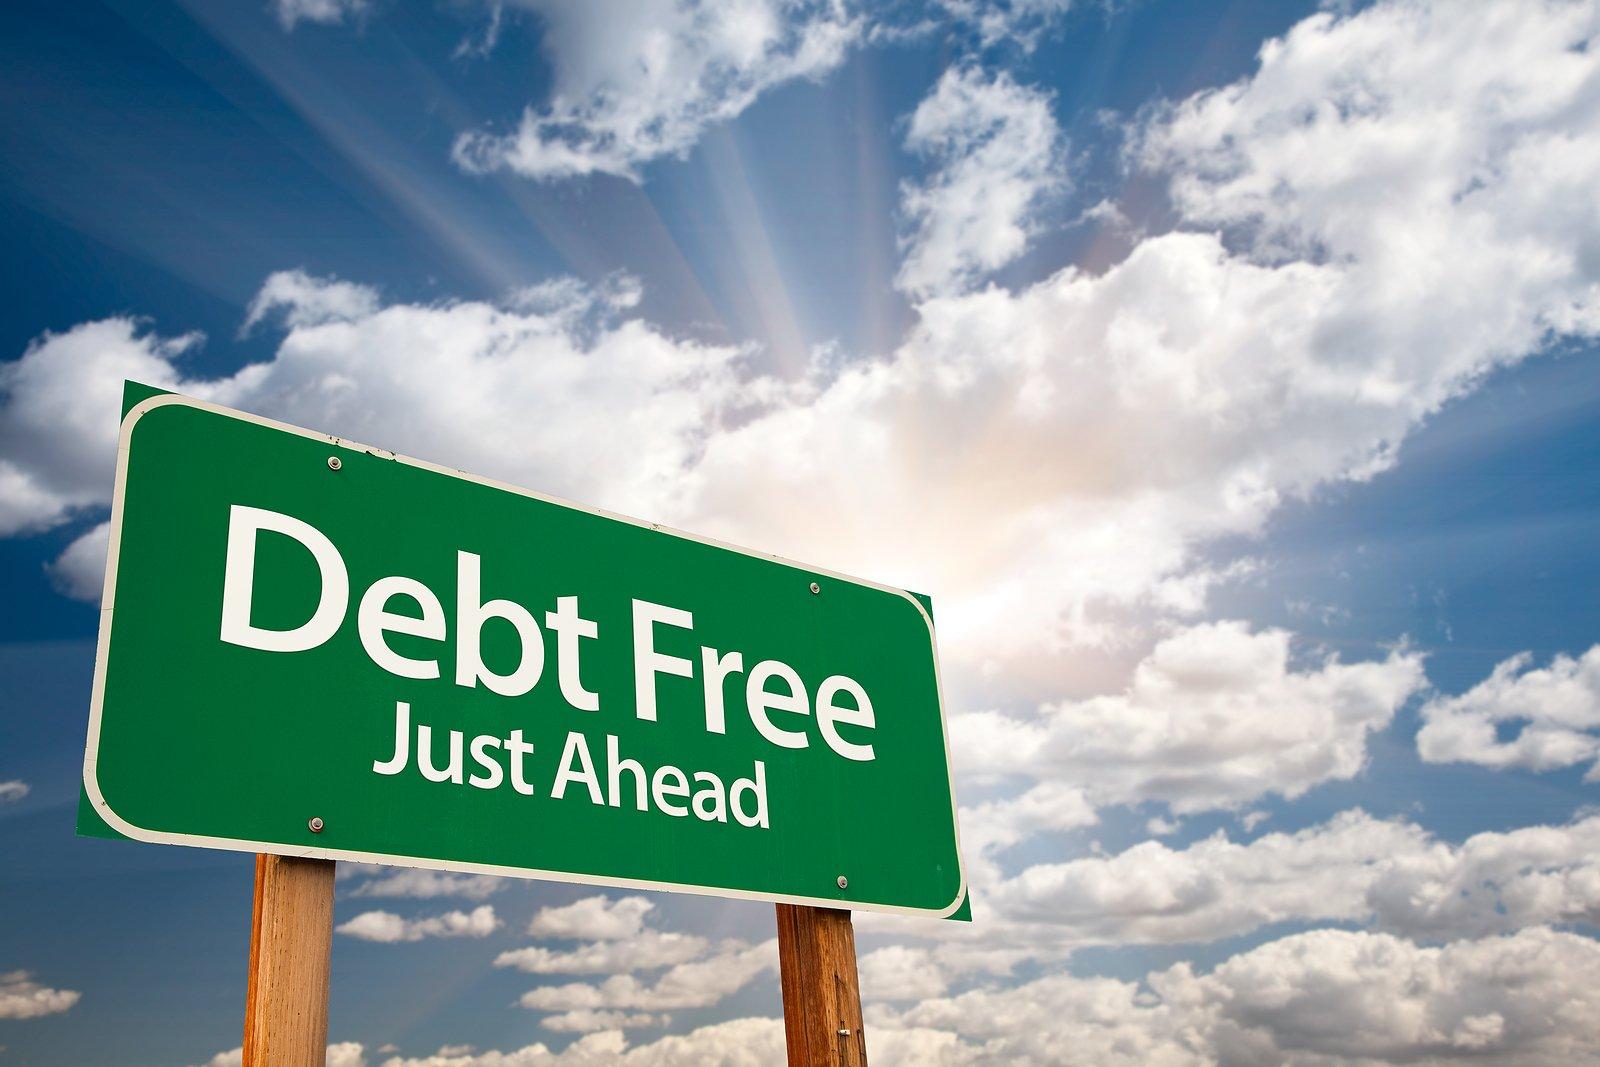 Debt-Free-Green-Road-Sign-myrick-cpa-dc